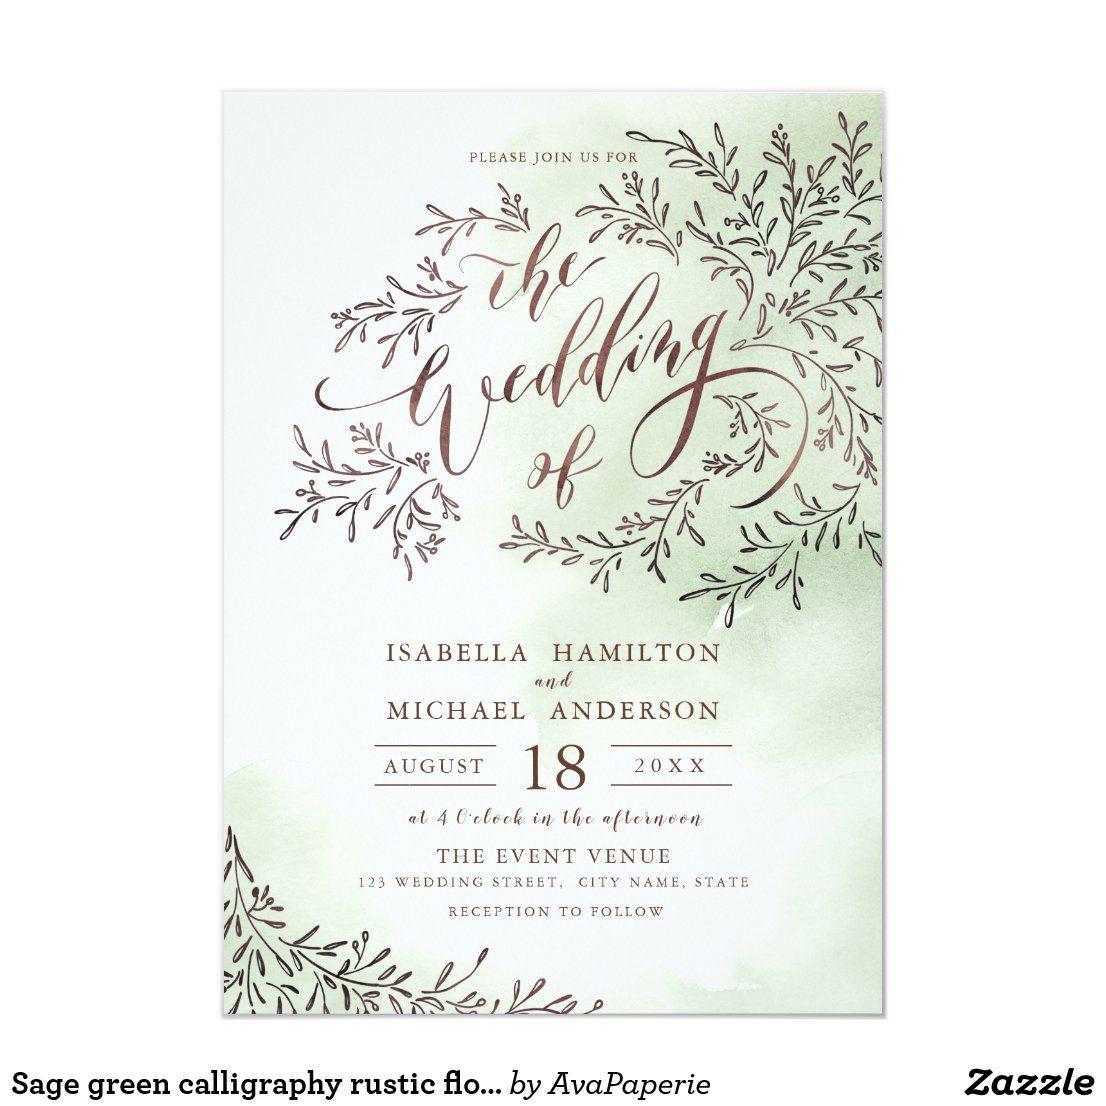 Sage green calligraphy rustic floral wedding invitation